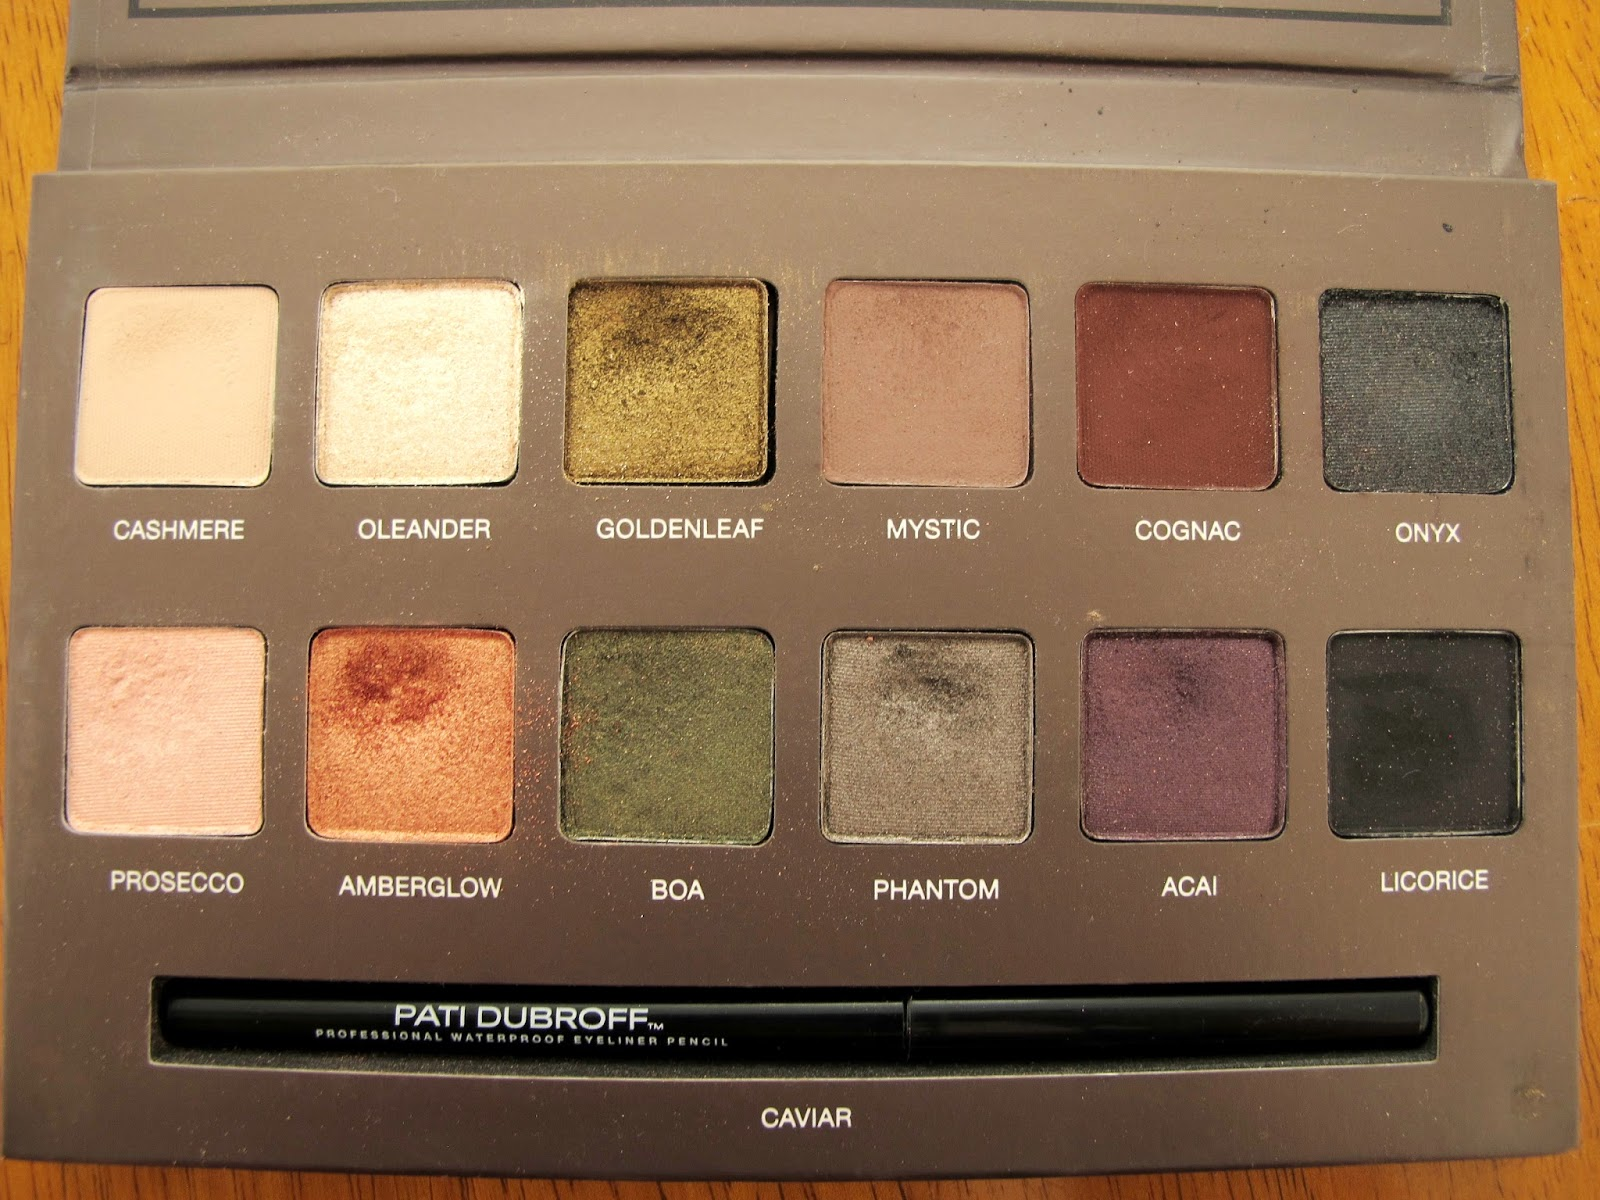 Pati Dubroff Spotlight Palette